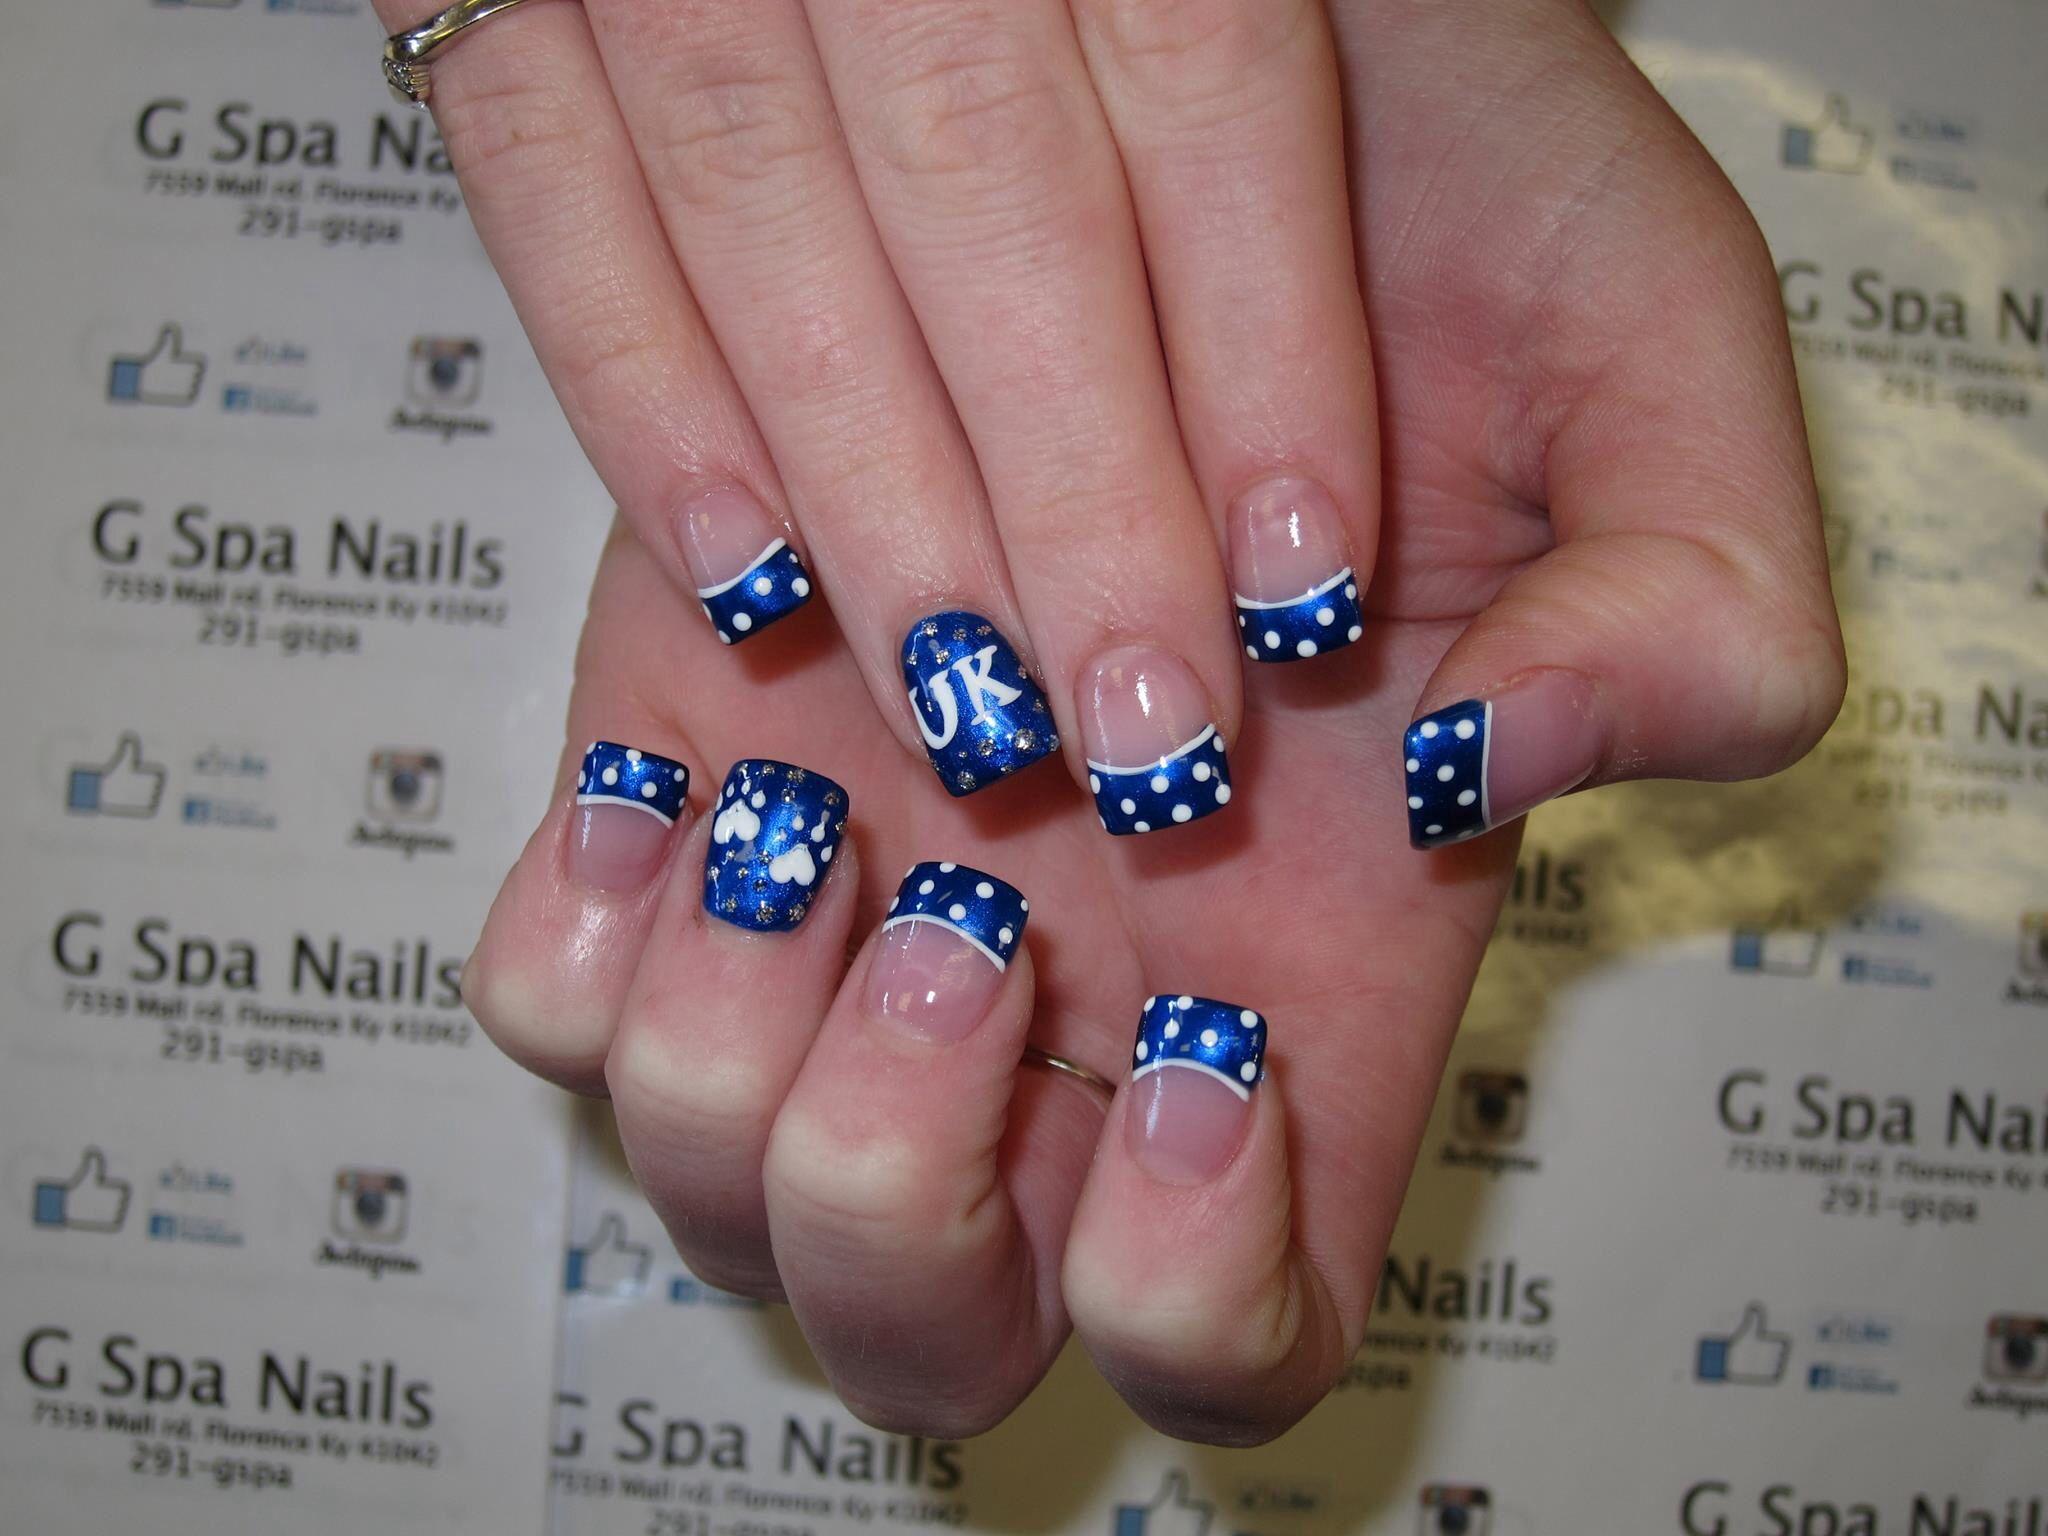 UK nails | Nail designs | Pinterest | Uk nails, Manicure and Makeup